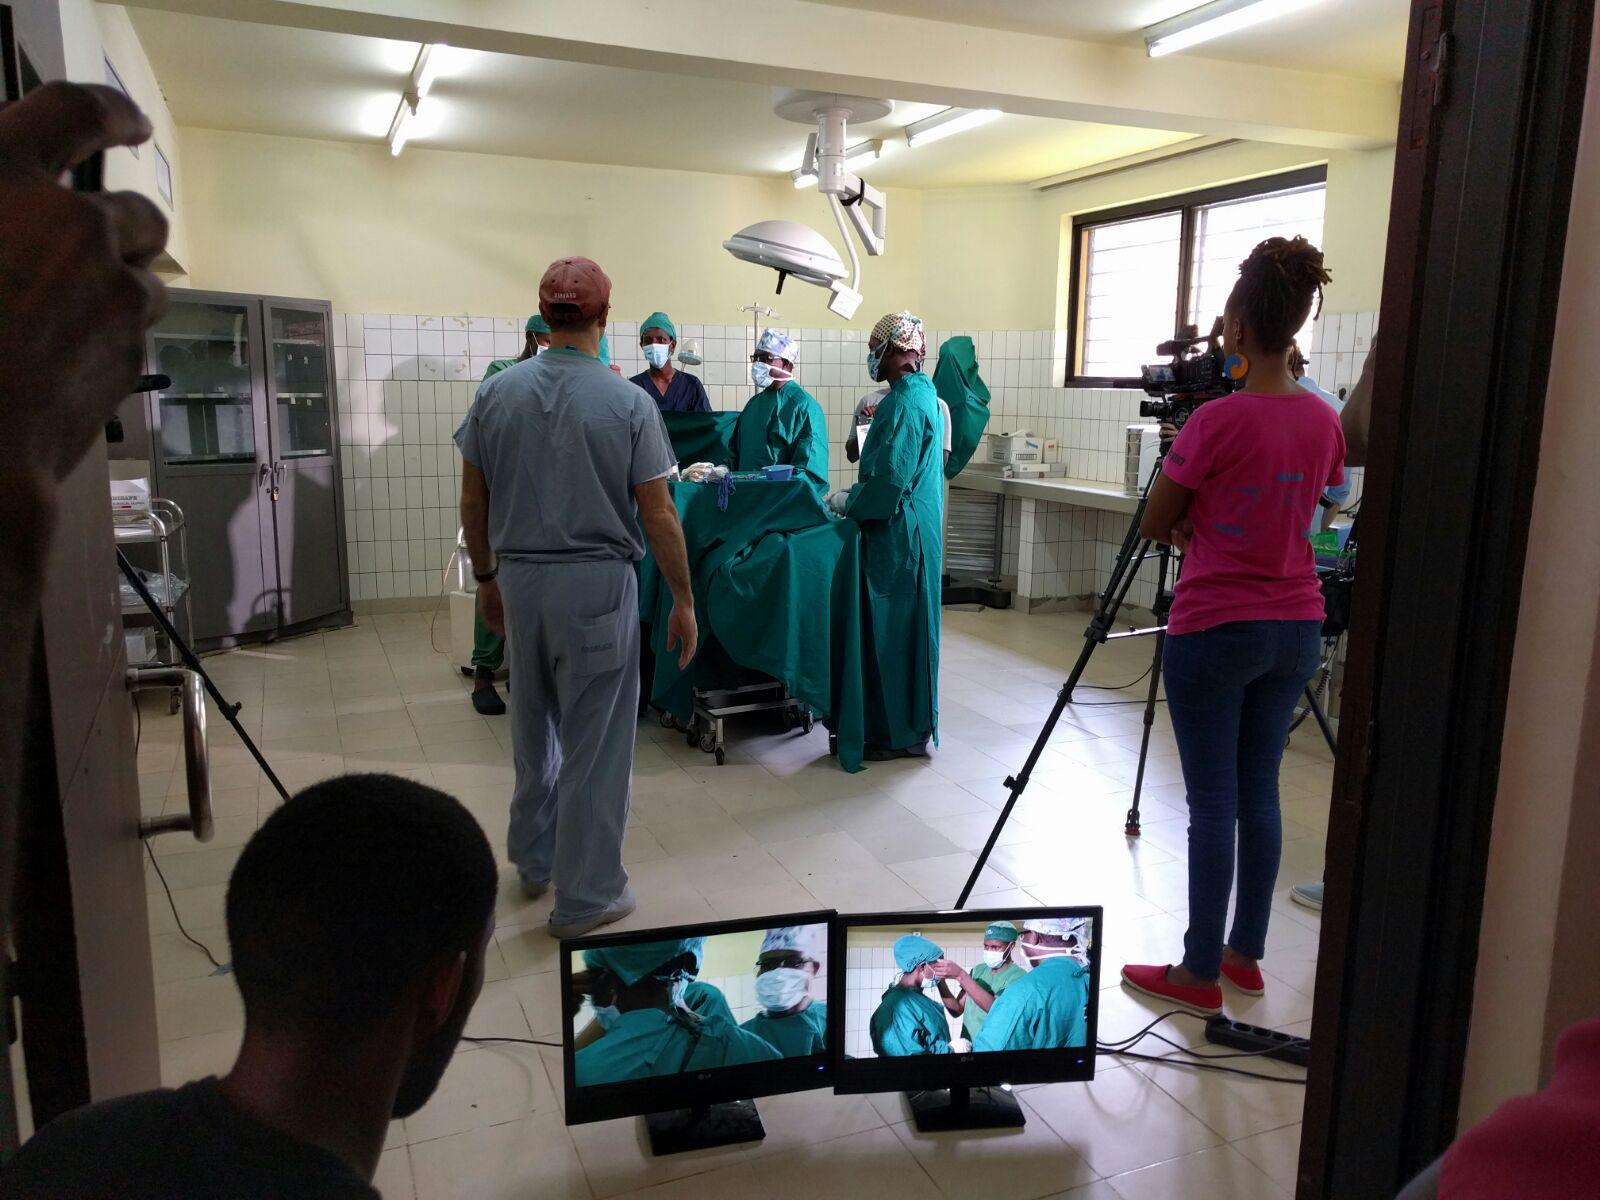 Filming NOTSS-VRC video scenarios in Kigali, Rwanda